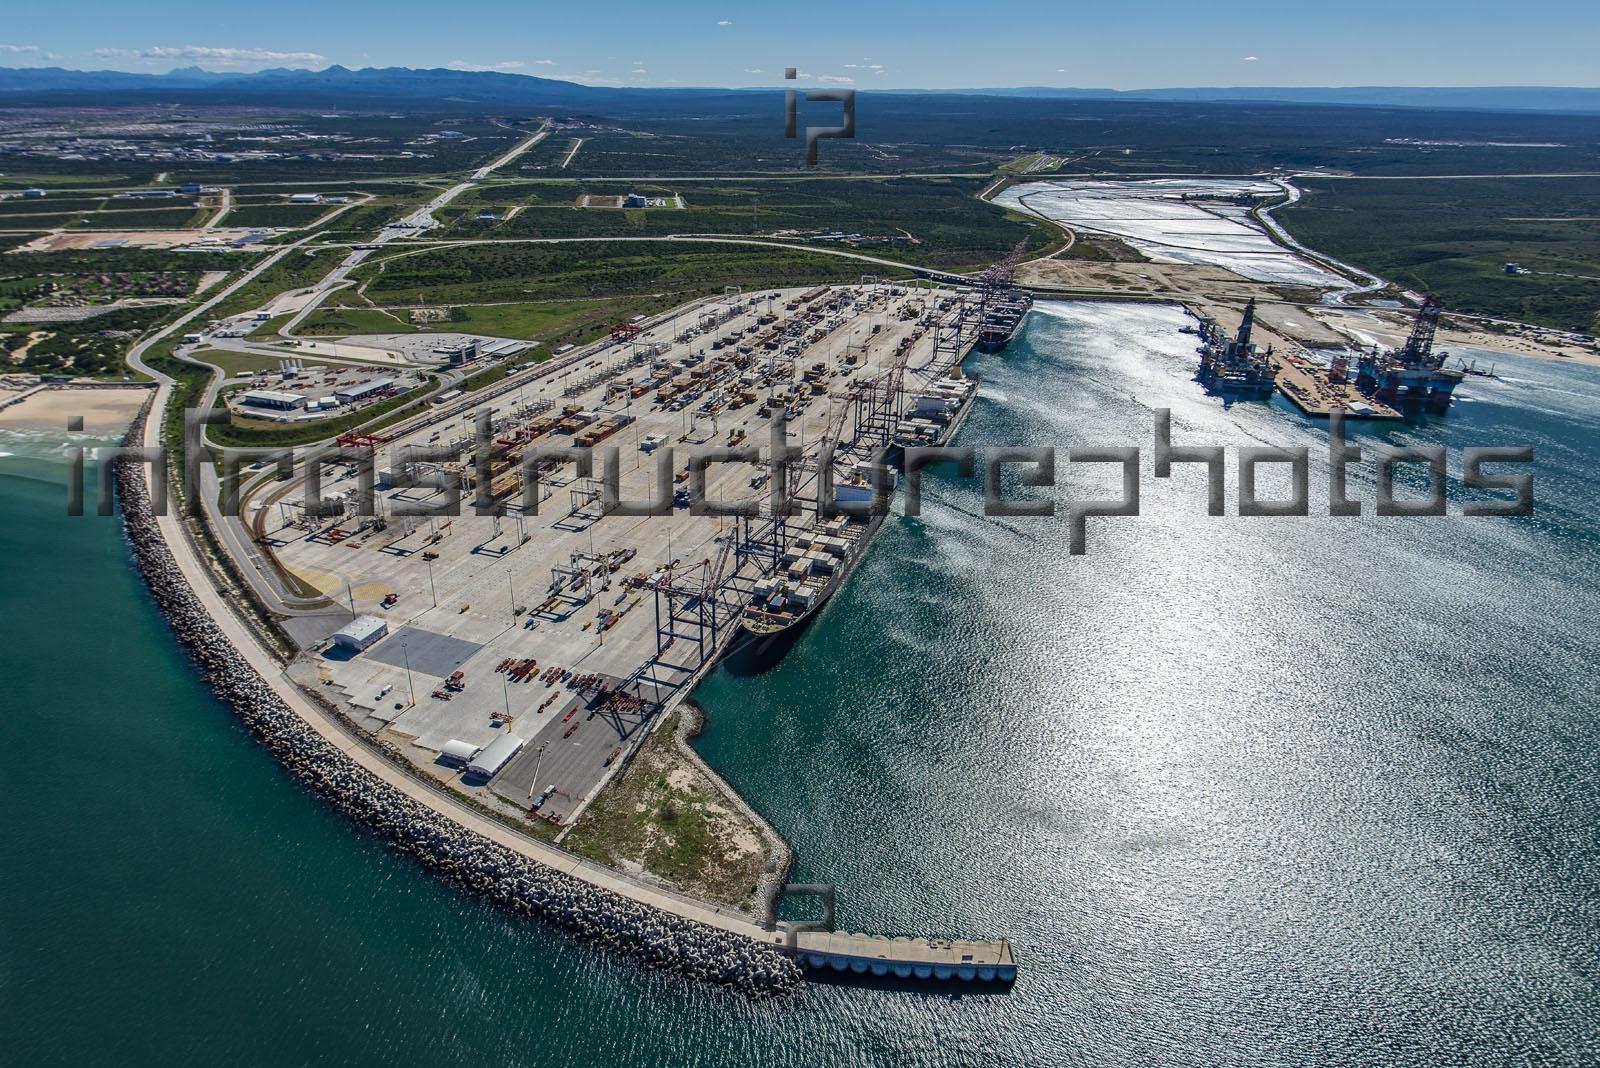 The Port of Ngquru